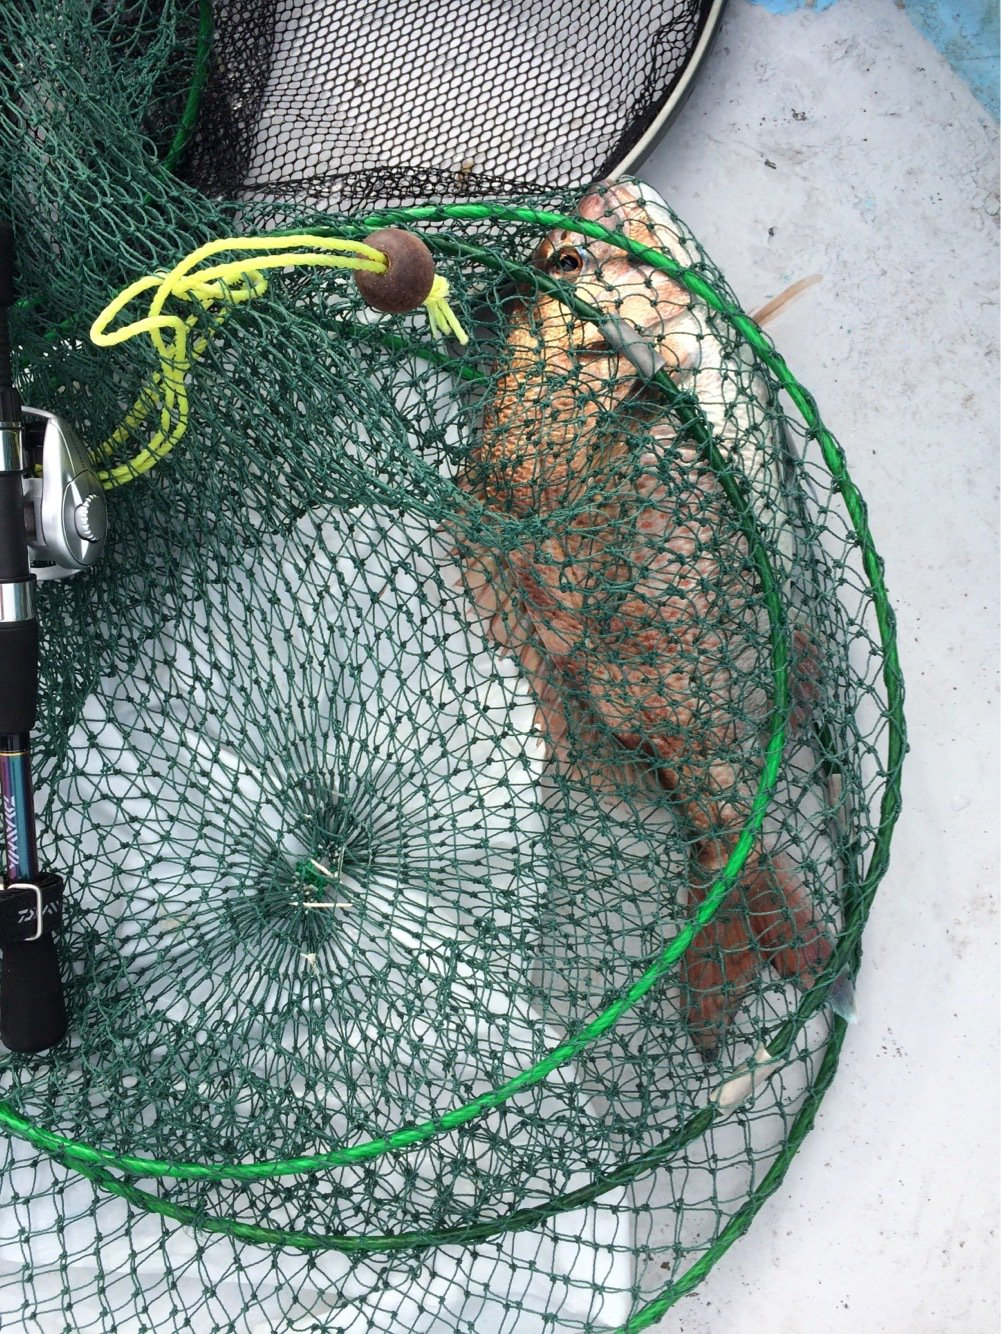 k.kobayasiさんの投稿画像,写っている魚はマダイ